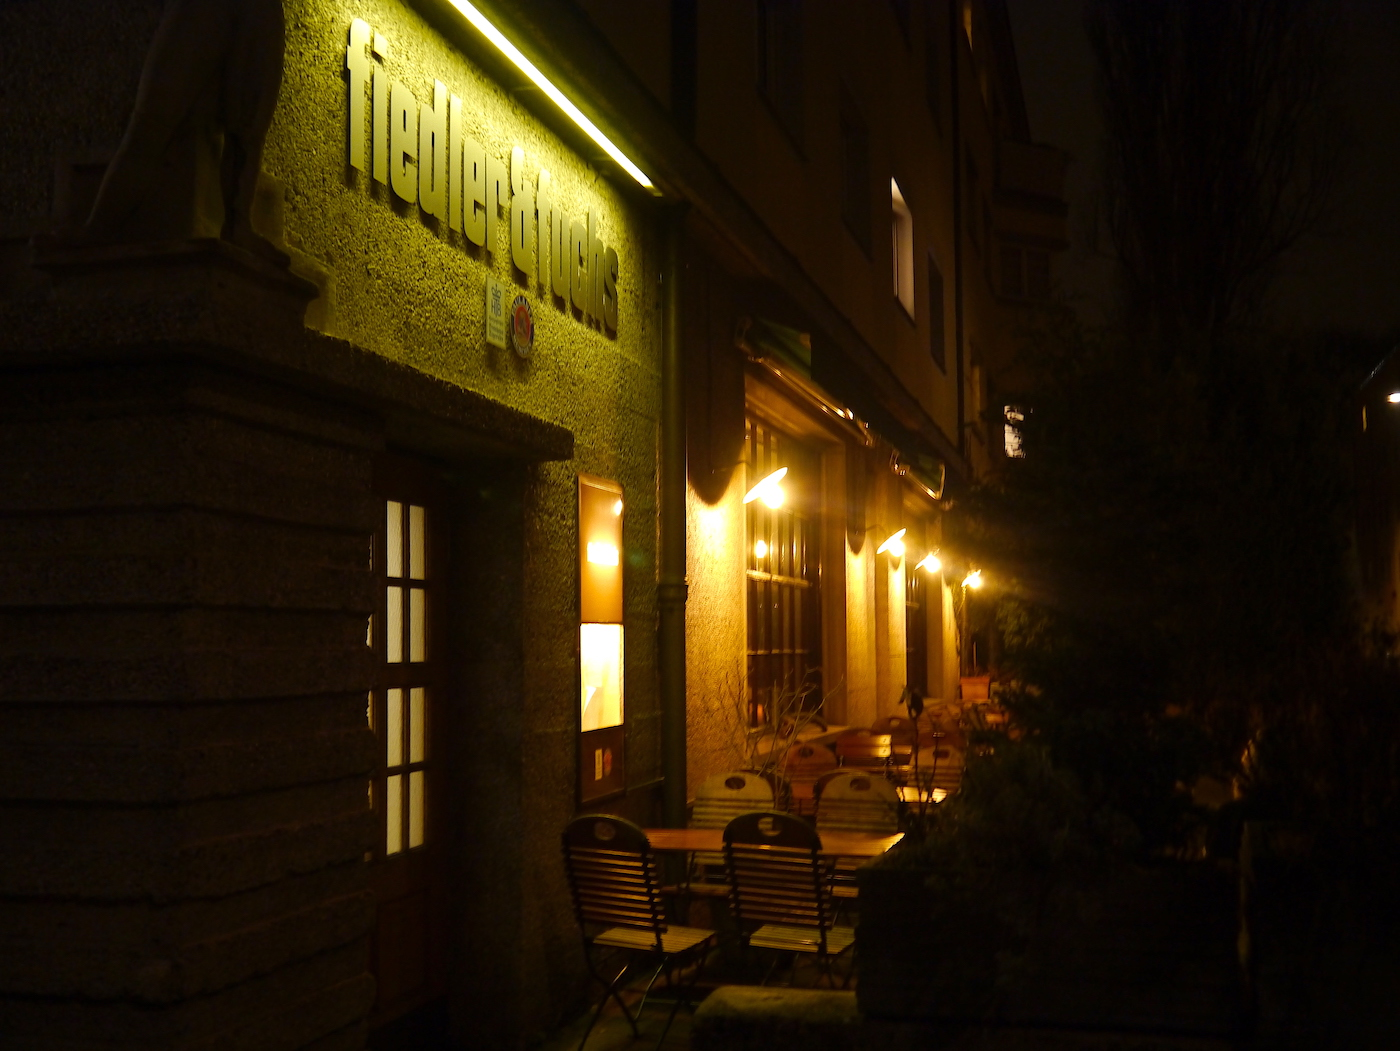 Fiedler & Fuchs, Best restaurants in Munich